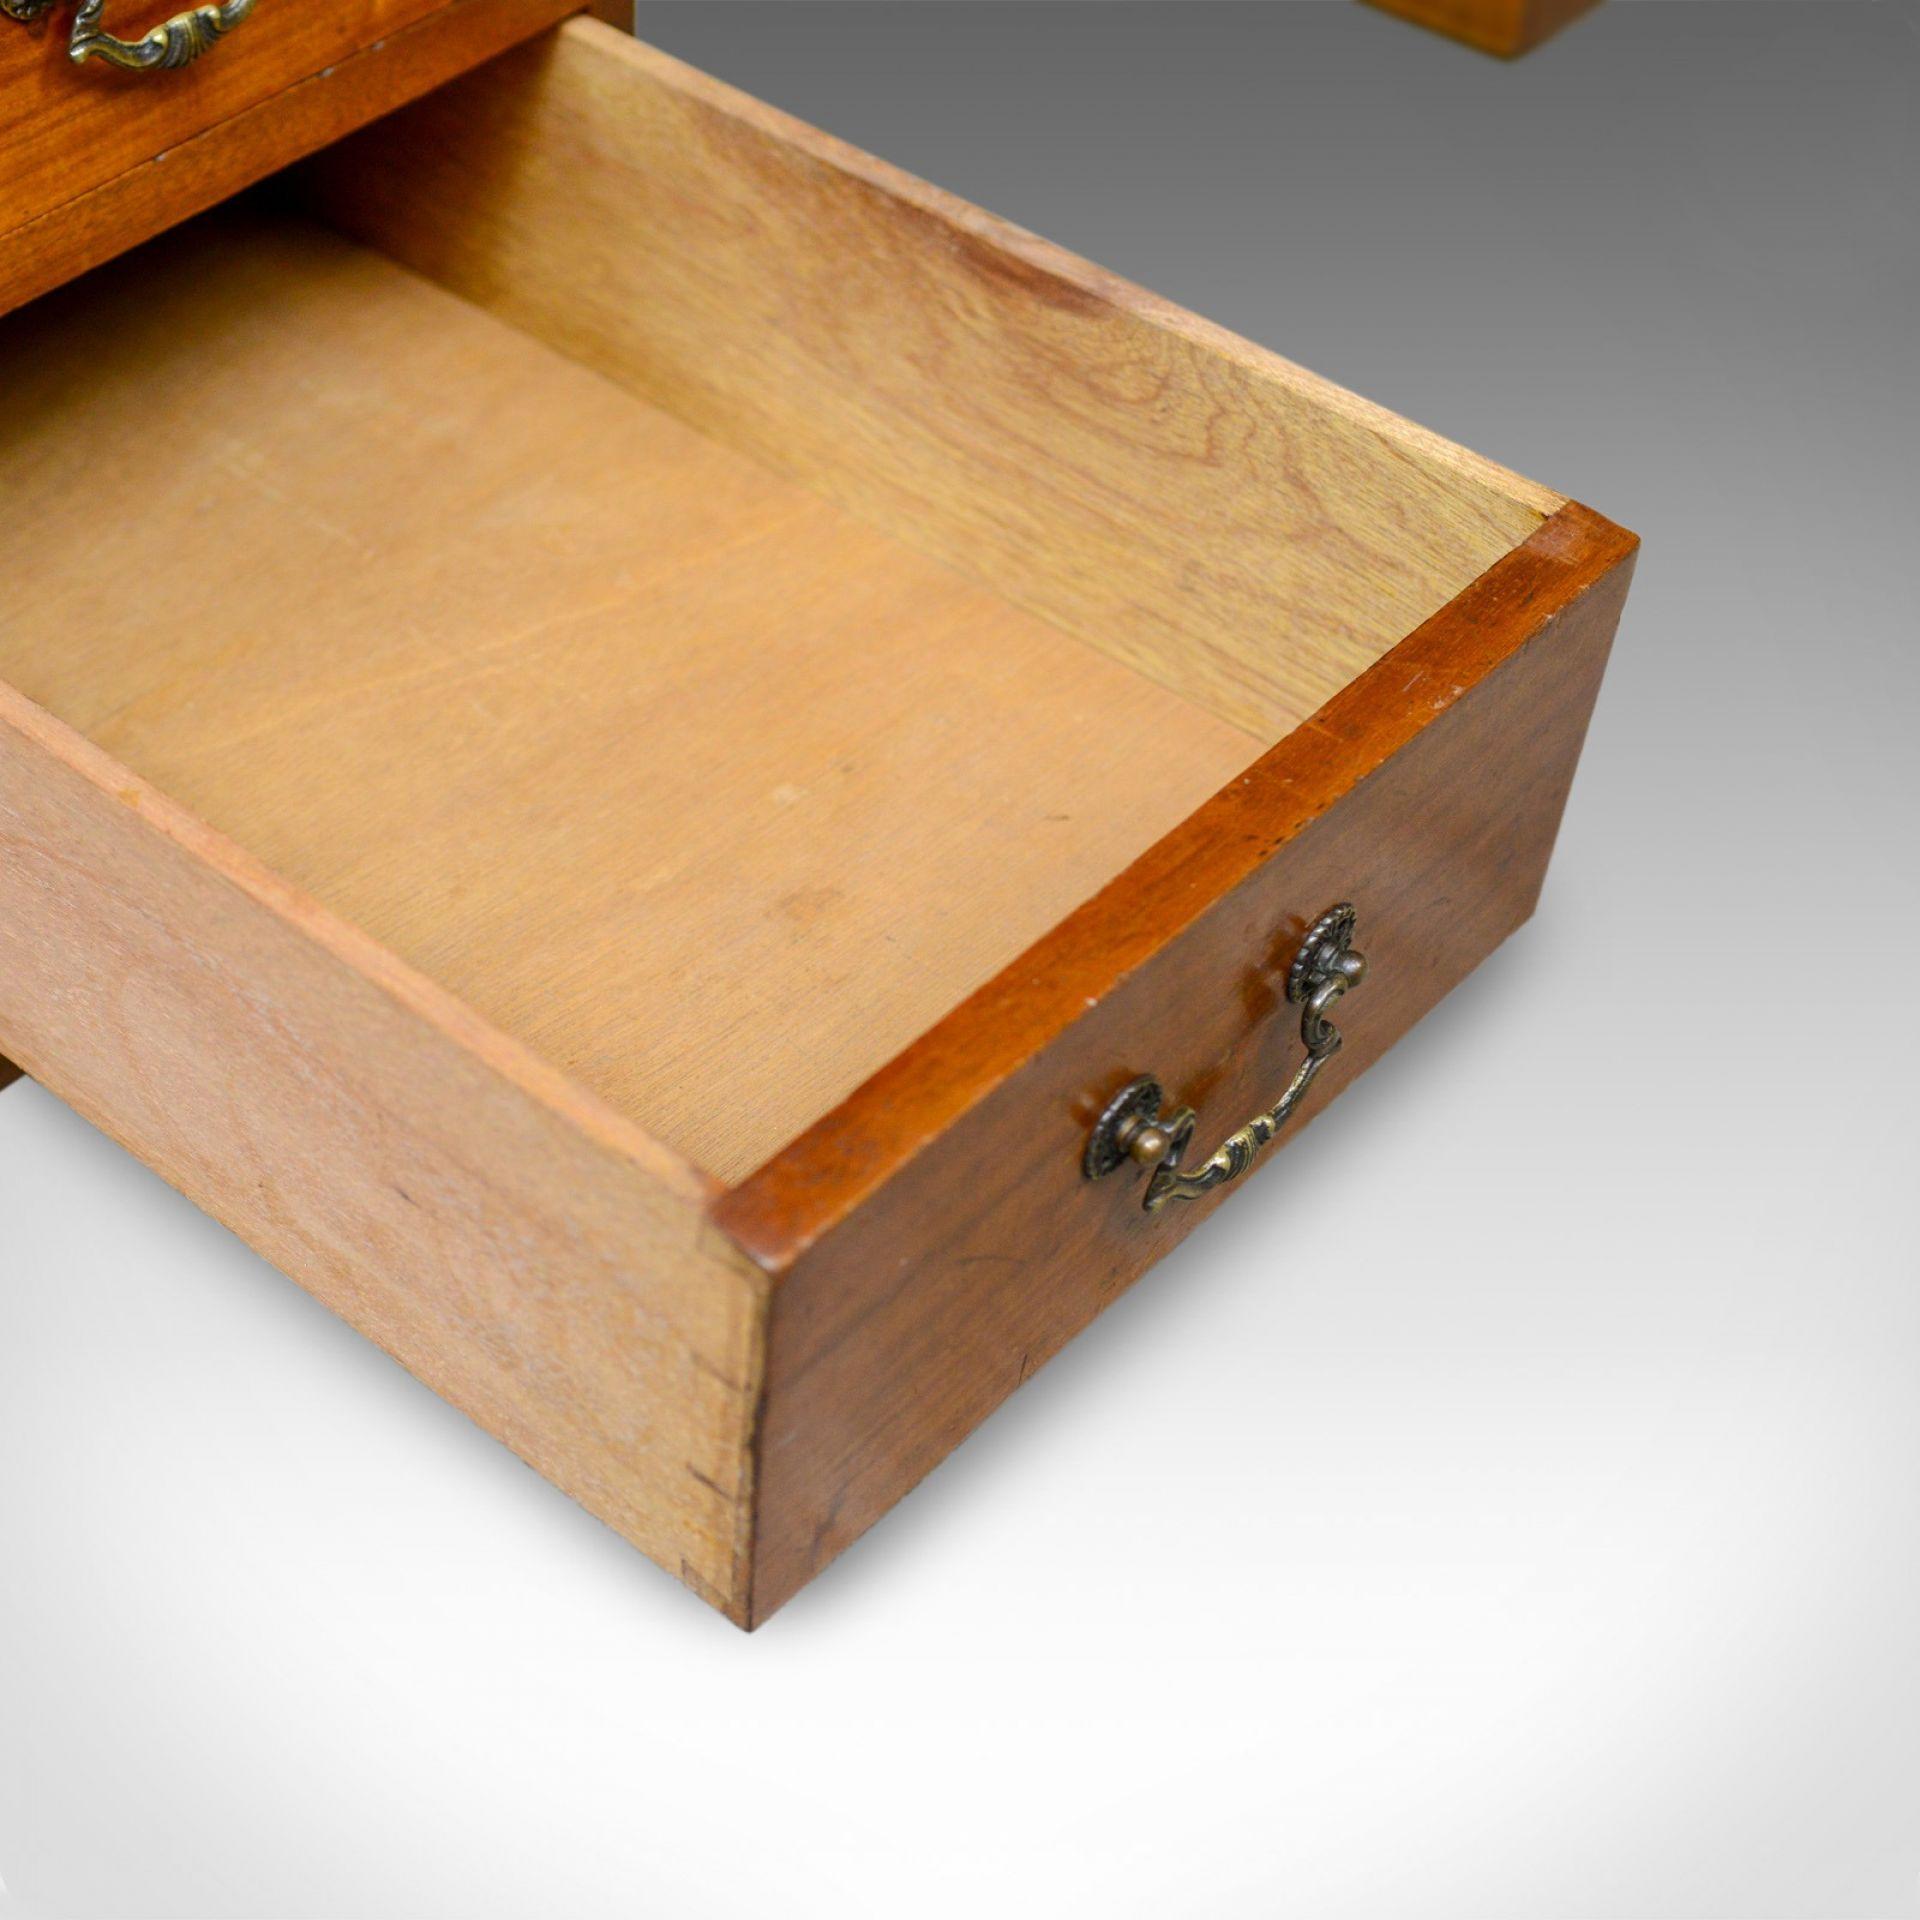 Vintage Pedestal Desk, English, Mahogany, Tooled Leather, Mid 20th Century